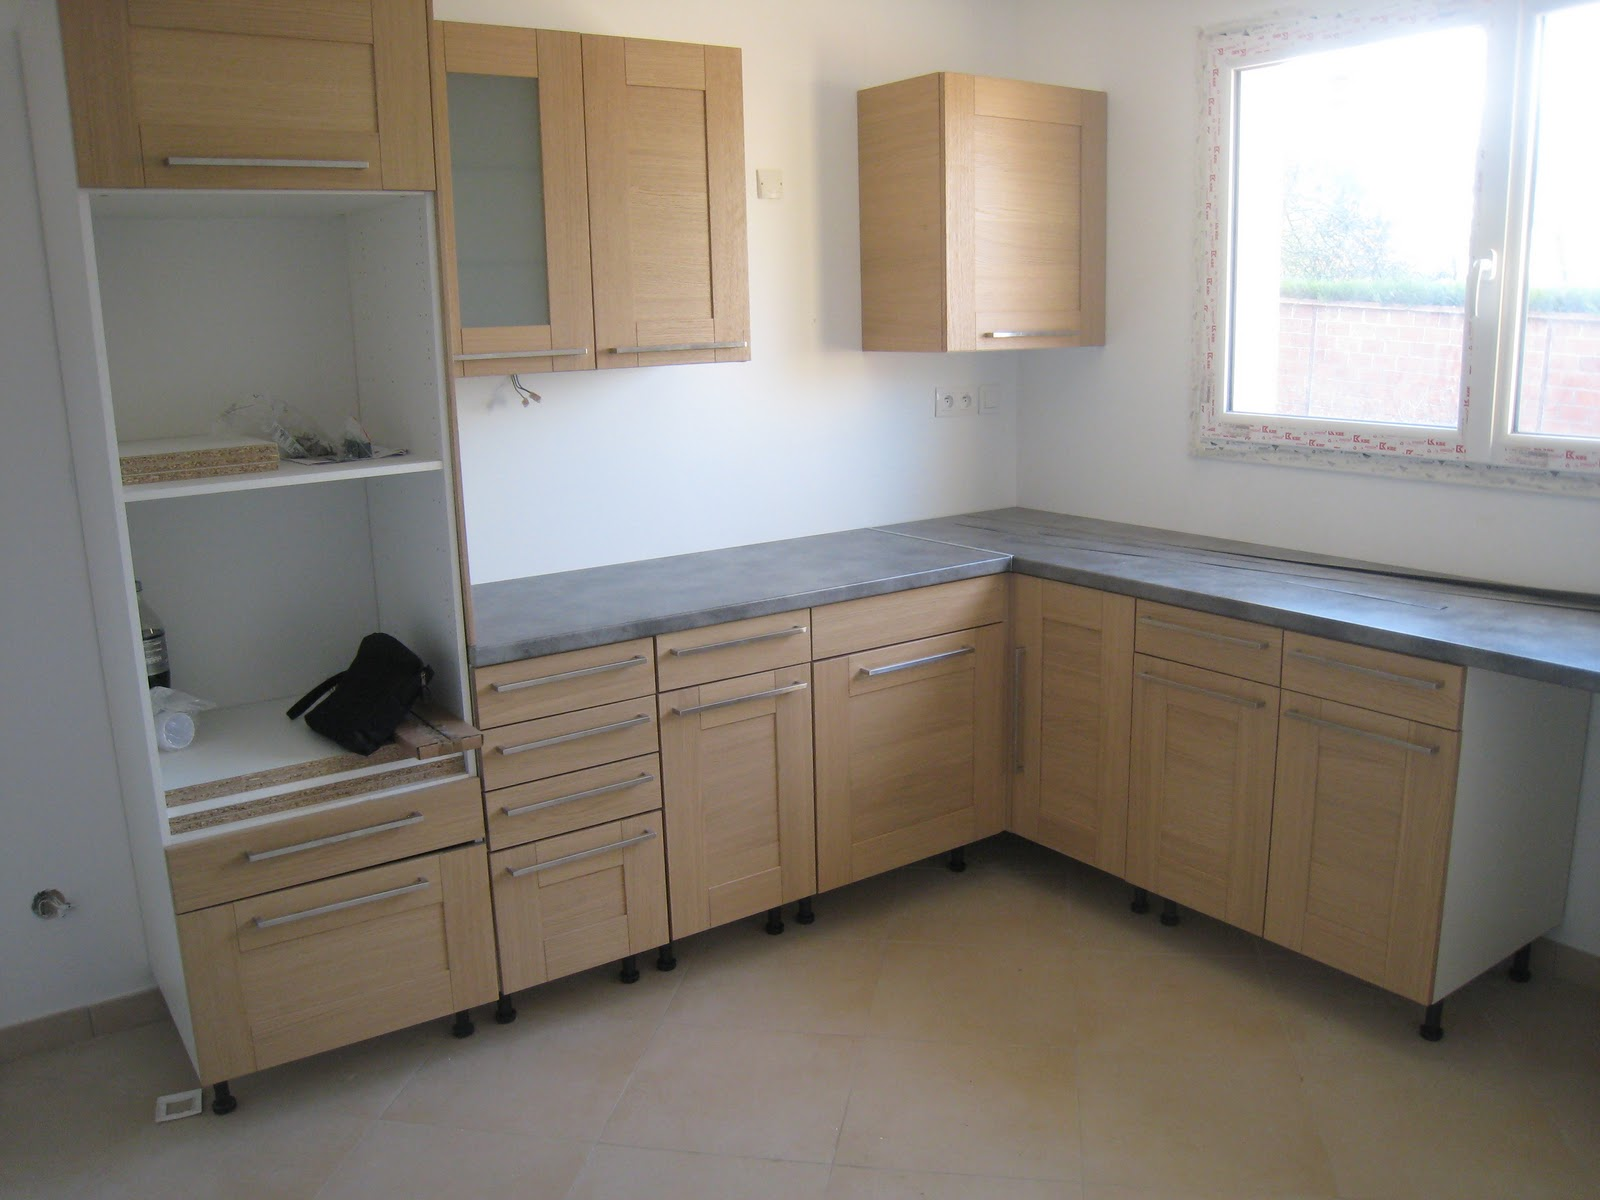 entreprise menuiserie charleroi antony devis gratuit cuisine soci t uujgsy. Black Bedroom Furniture Sets. Home Design Ideas